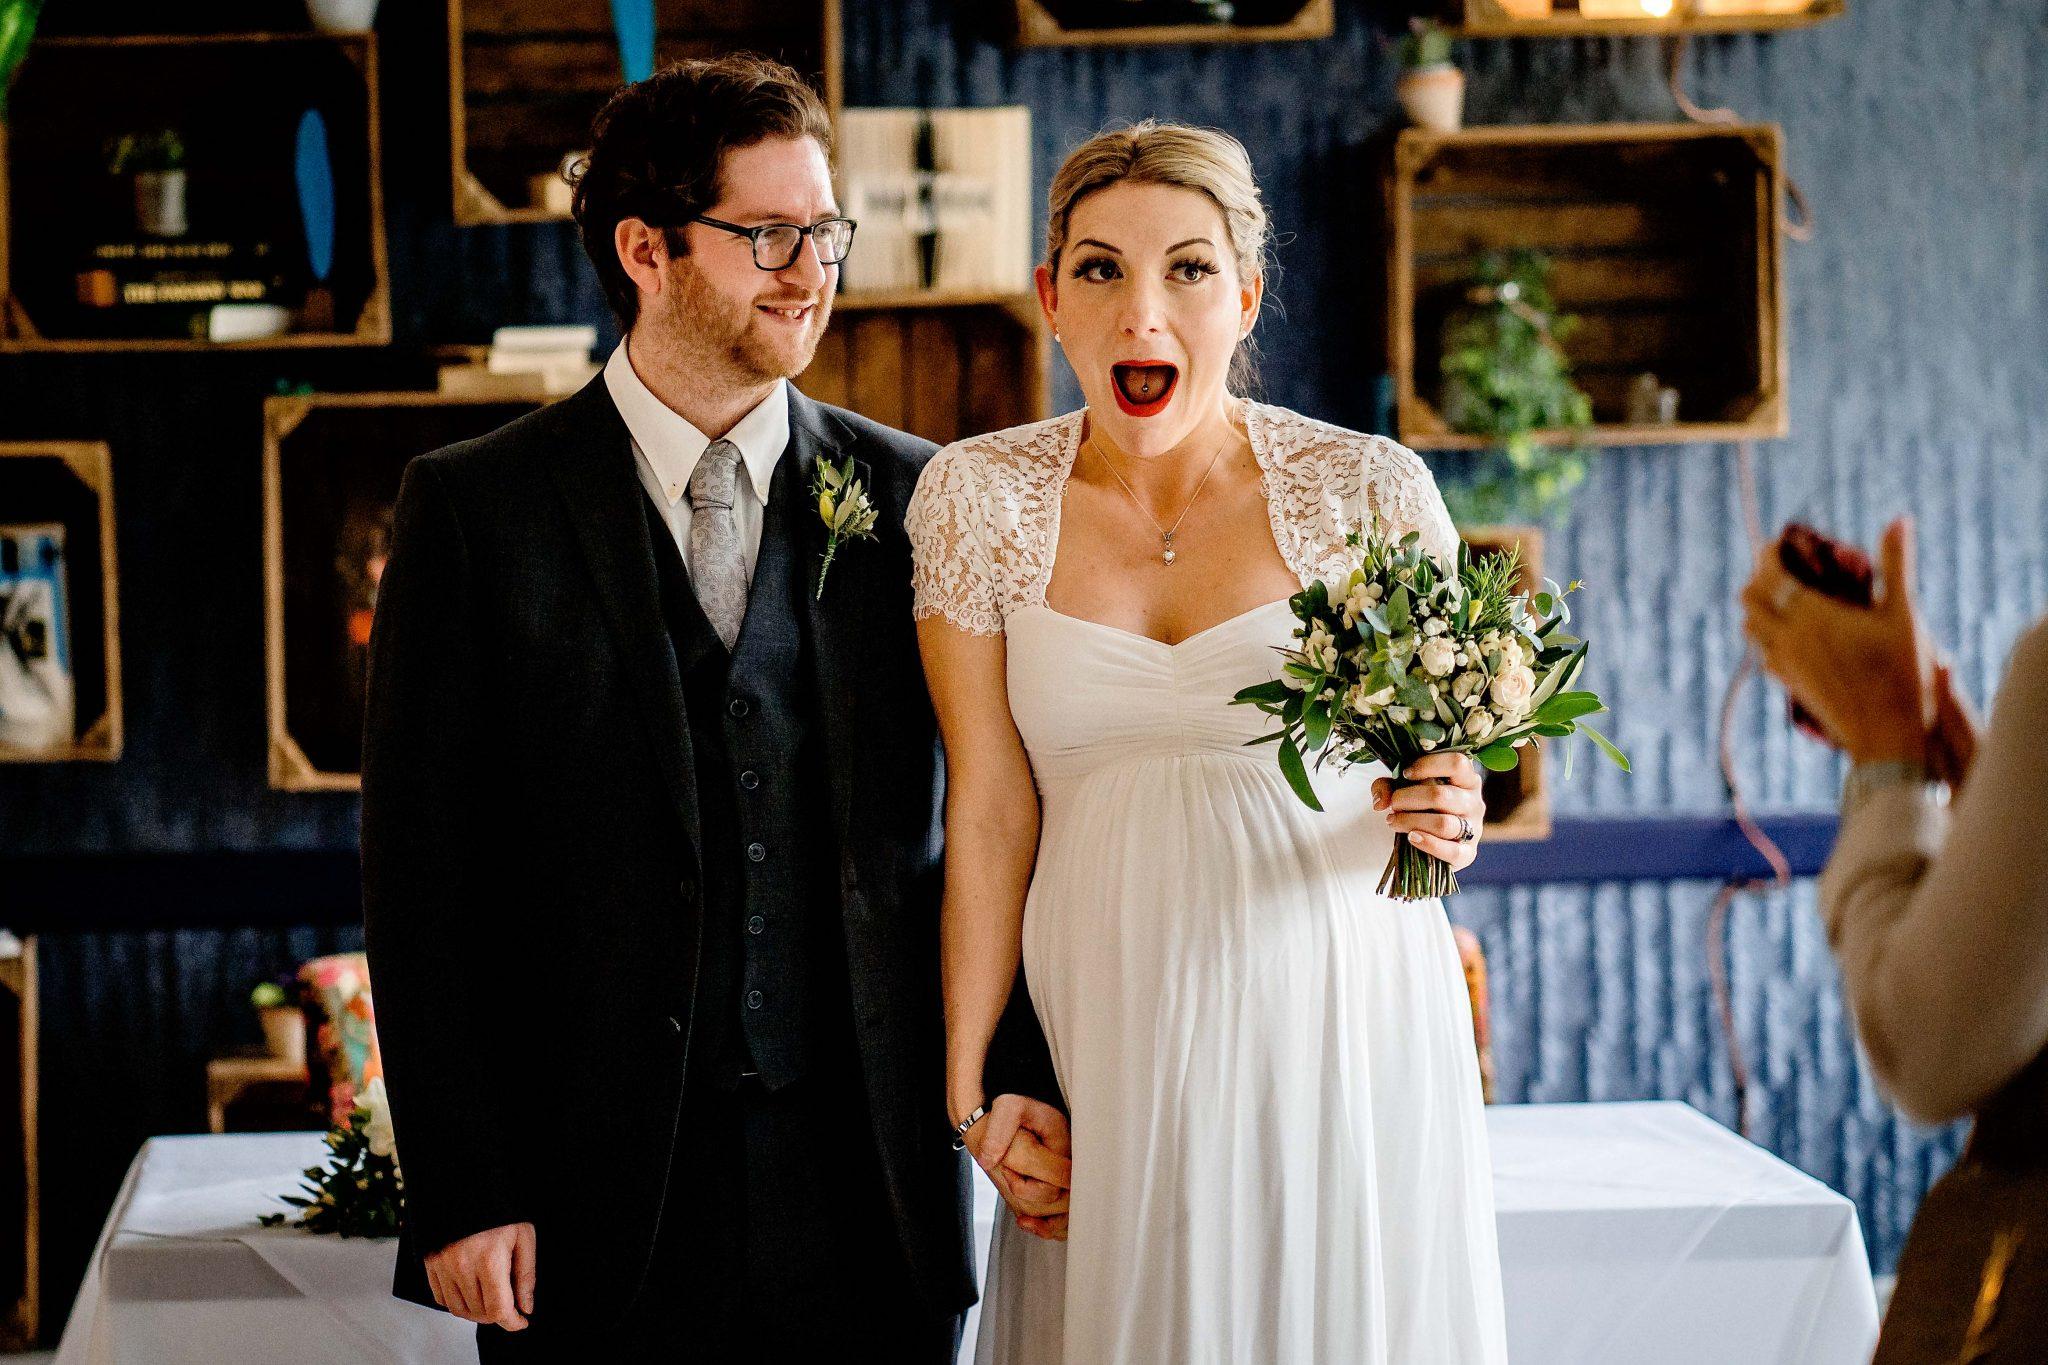 107-Lindeth-Howe-Wedding-Windermere-Wedding-Photographer-by-Ollie-Gyte-Photography